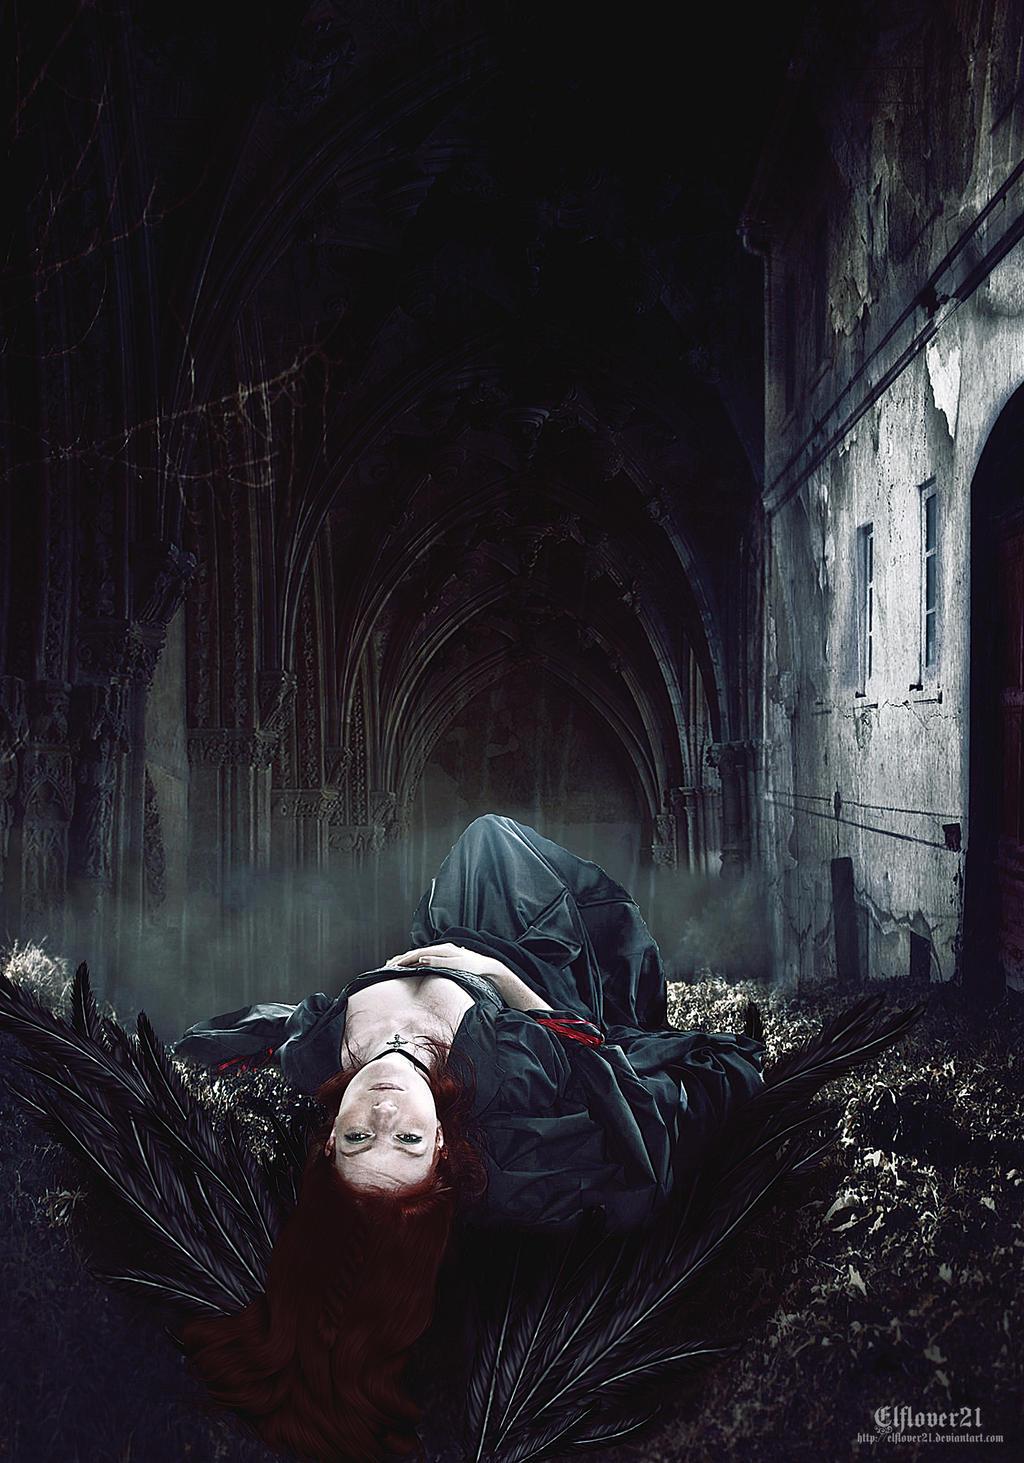 Towards Silence by Elflover21